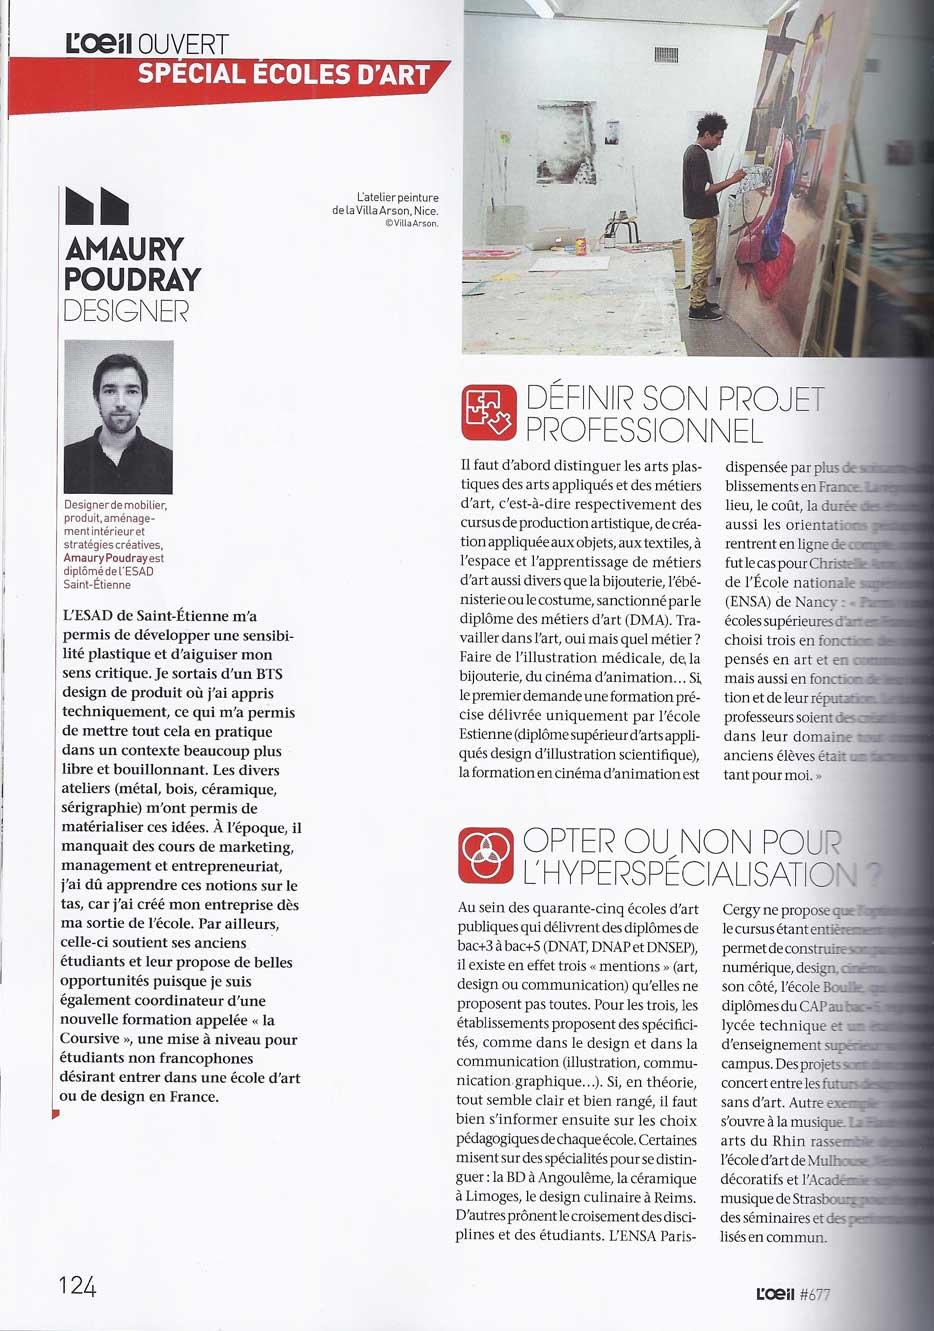 Amaury Poudray interveiw